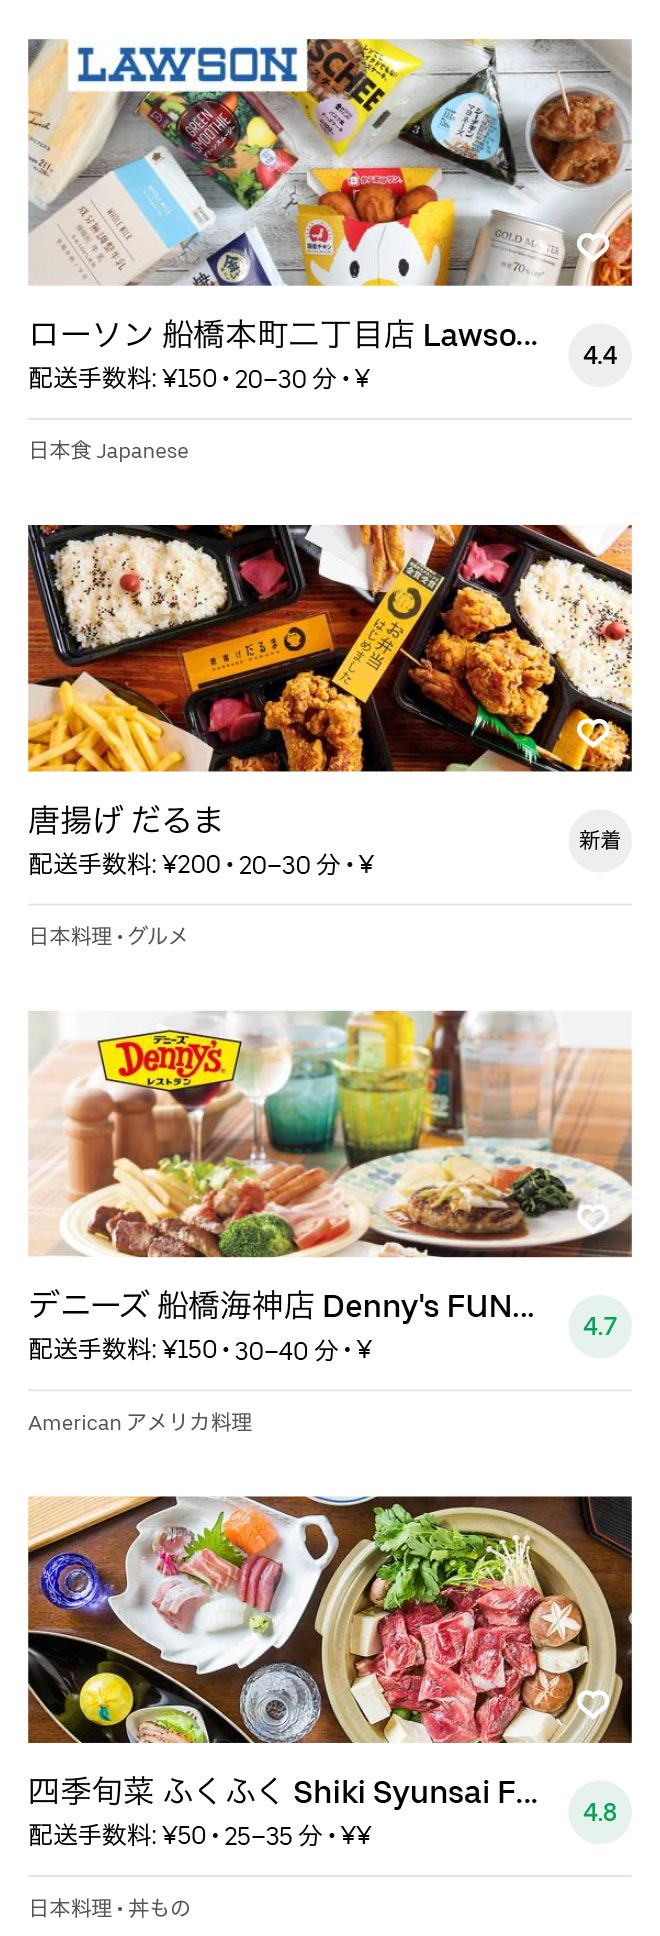 Funabashi menu 2008 10